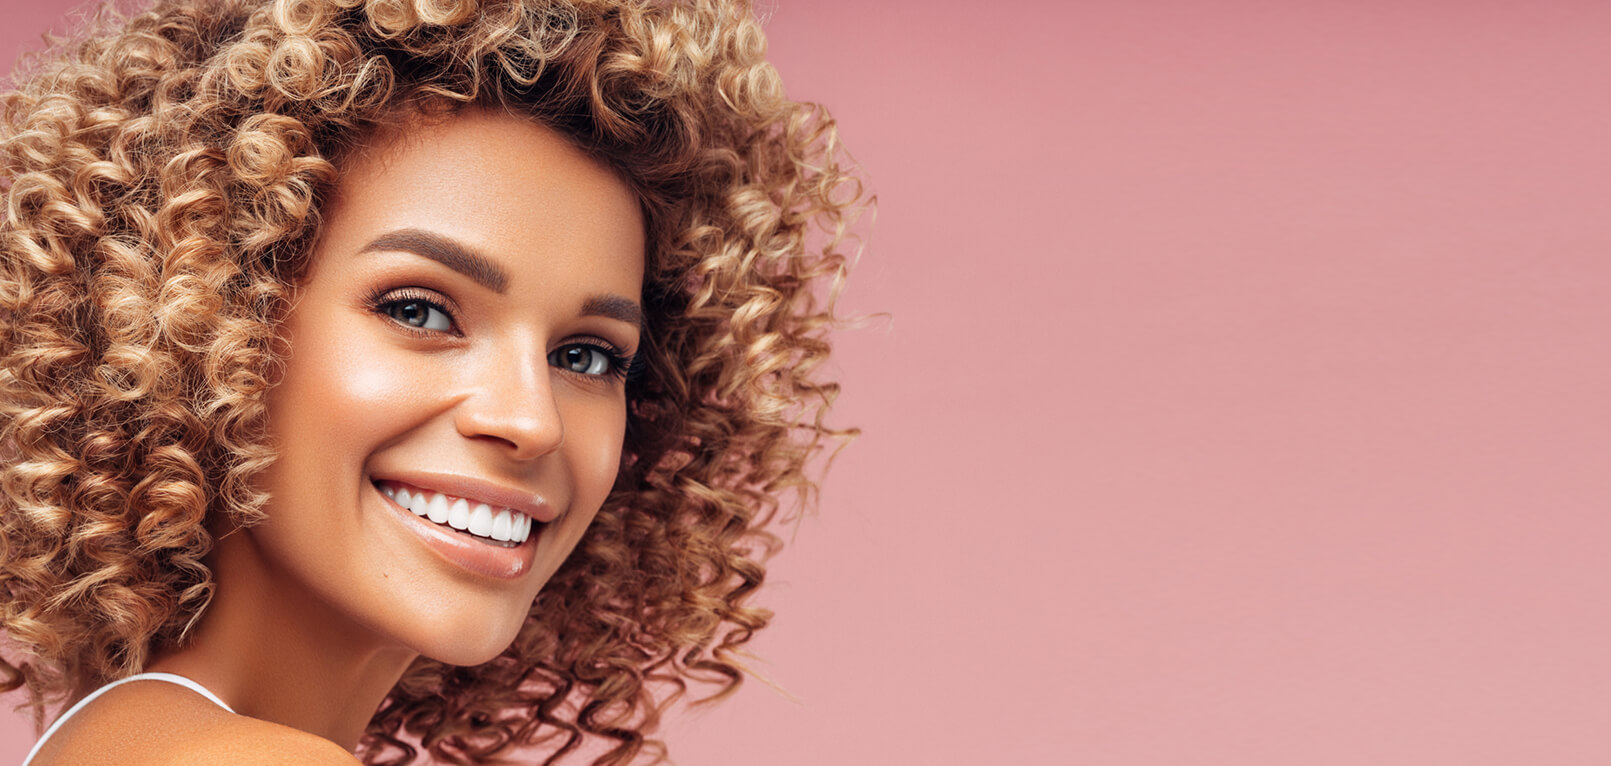 model woman smiling